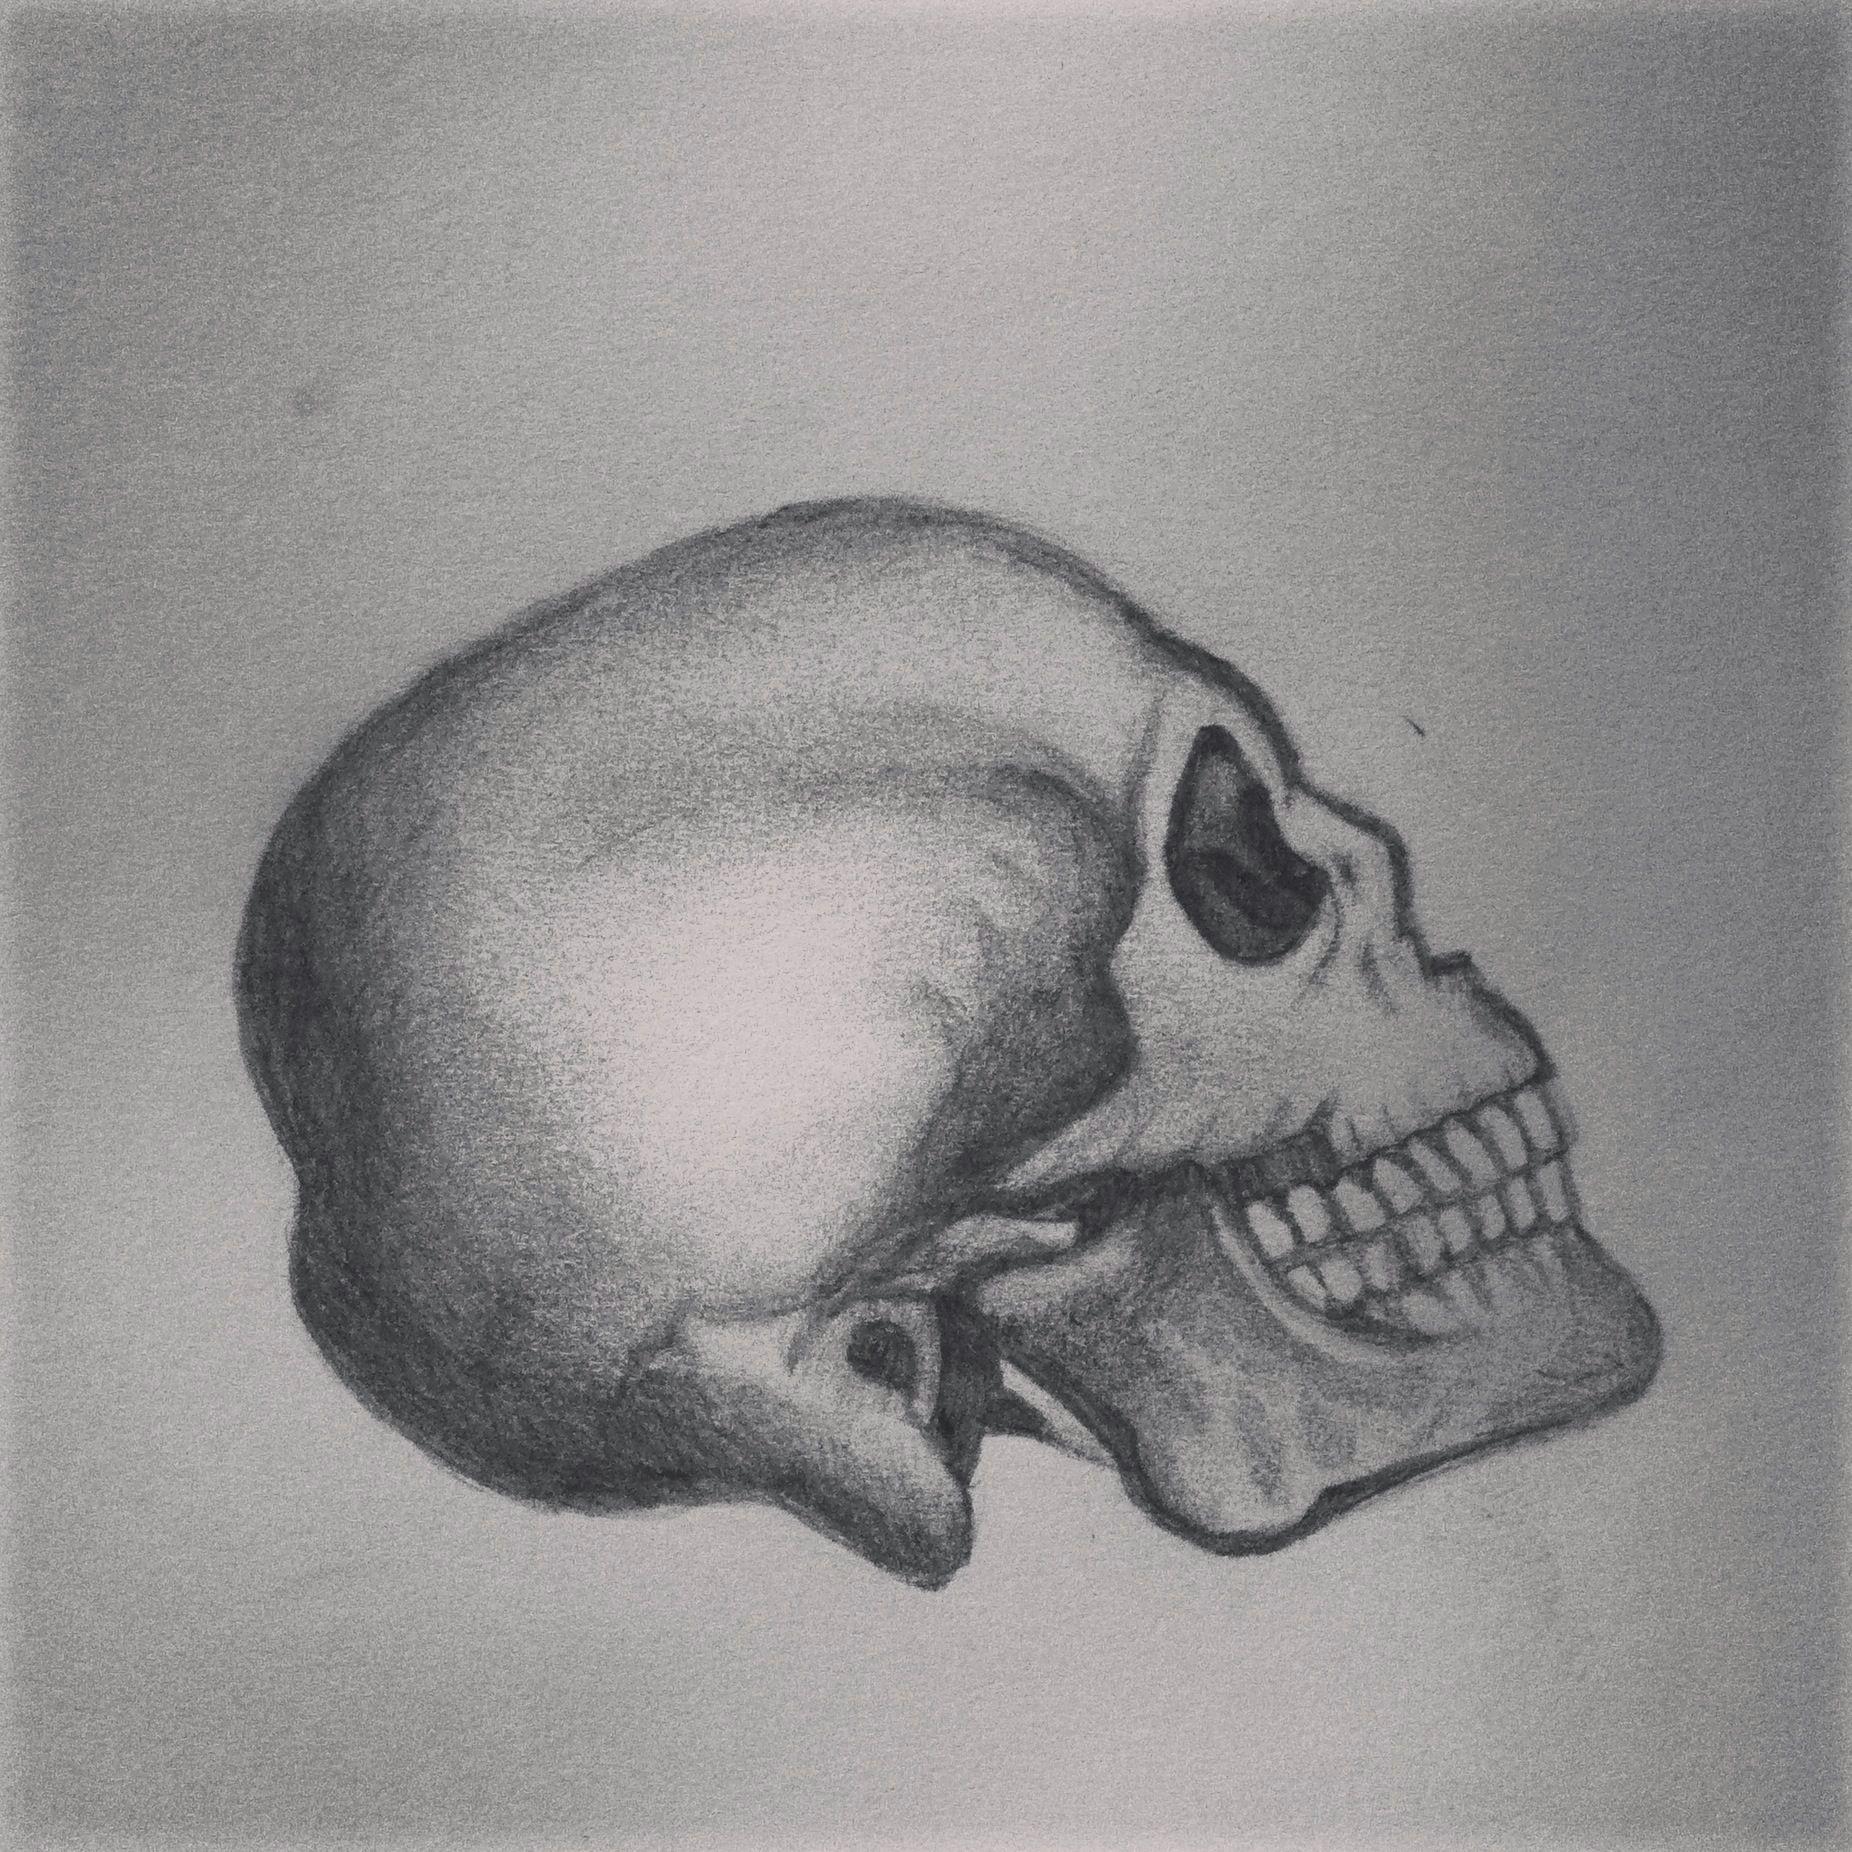 skull head pencil shading drawing sketch tattoo idea design art